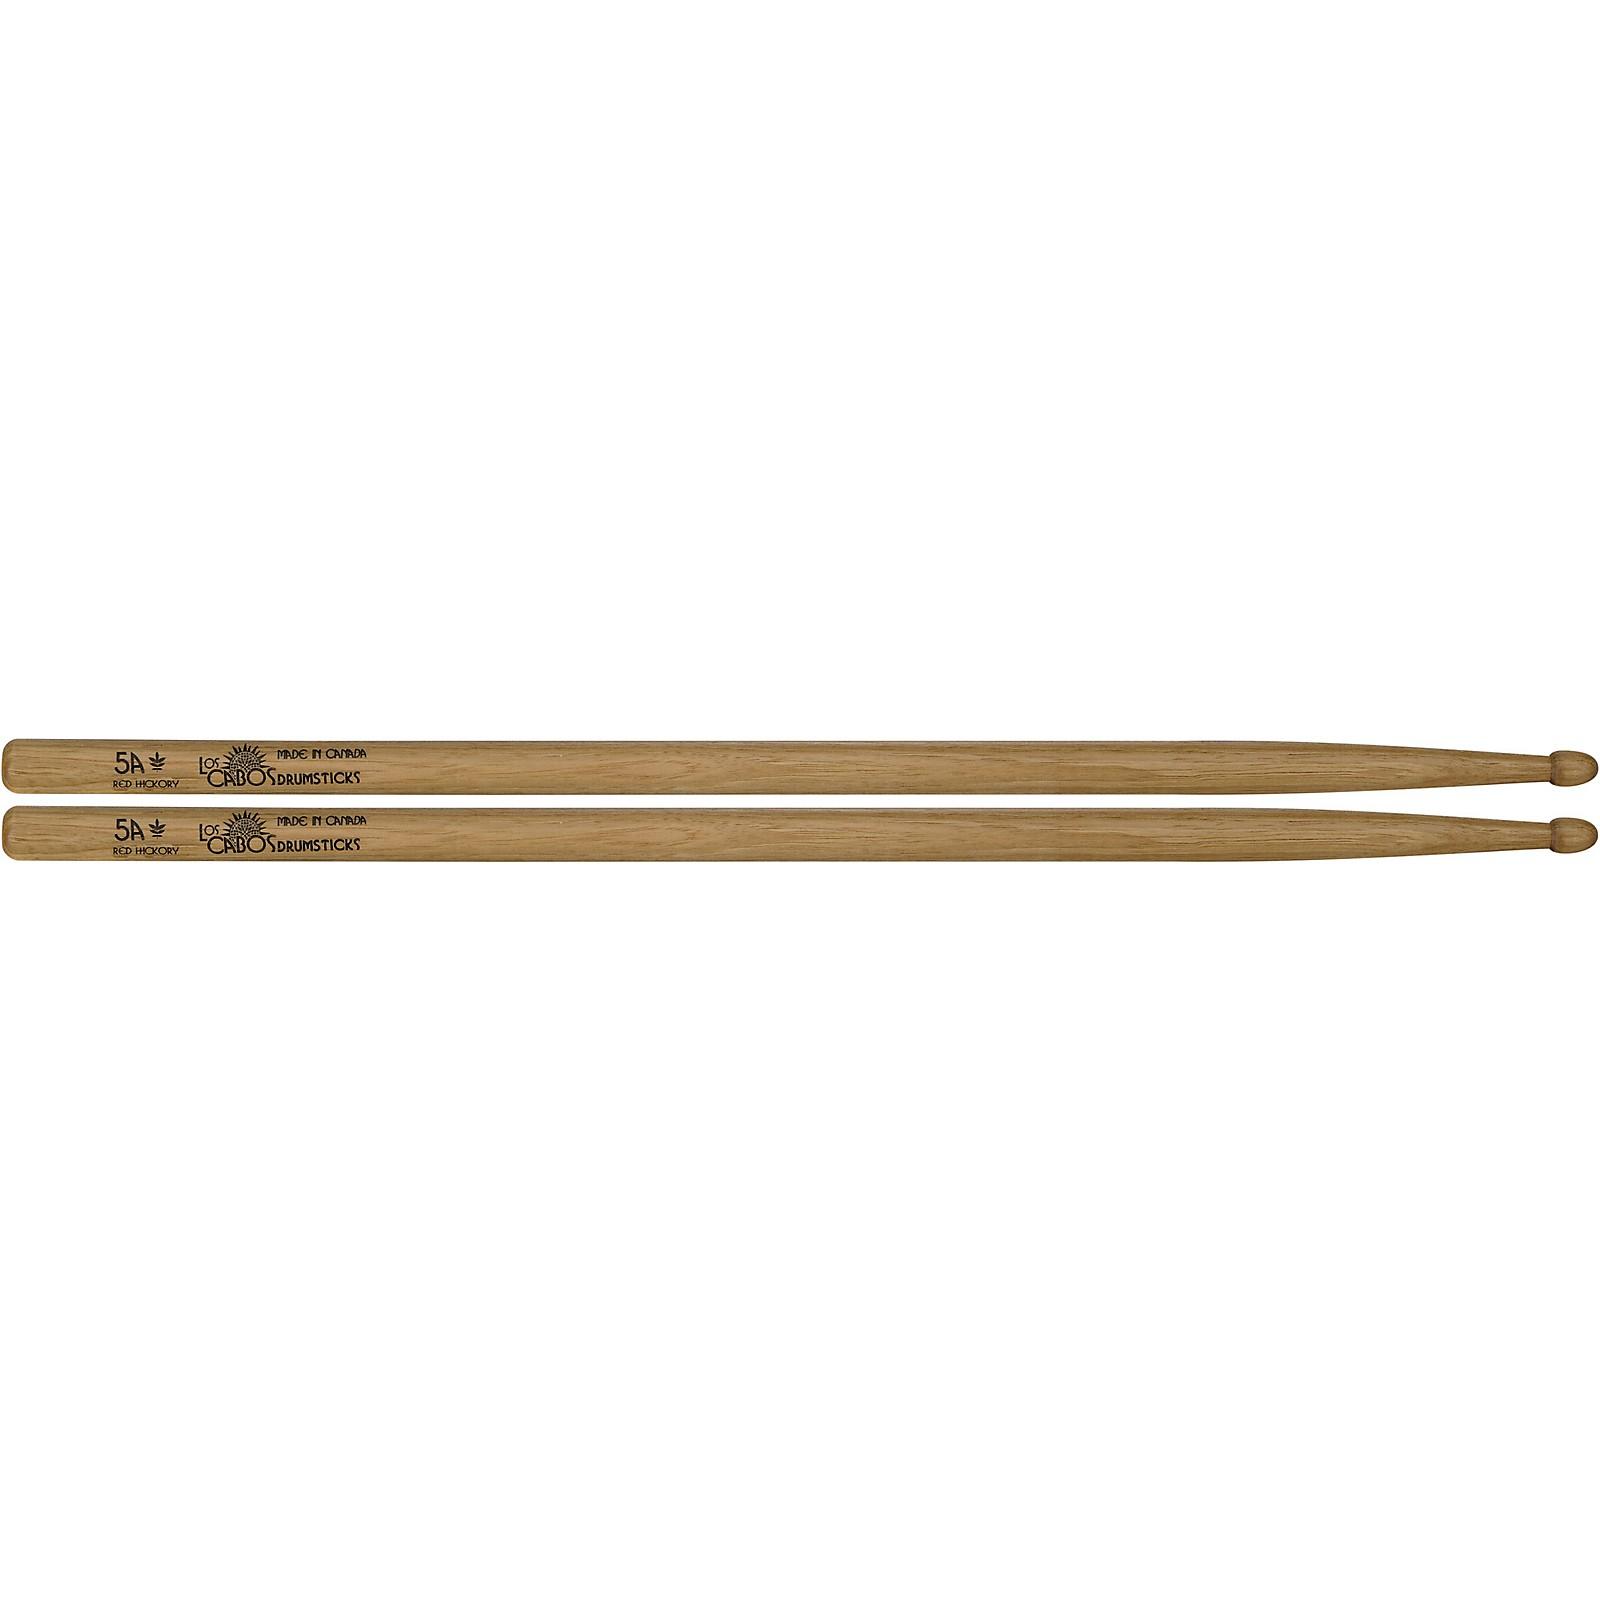 Los Cabos Drumsticks Red Hickory Center Cut Drum Sticks